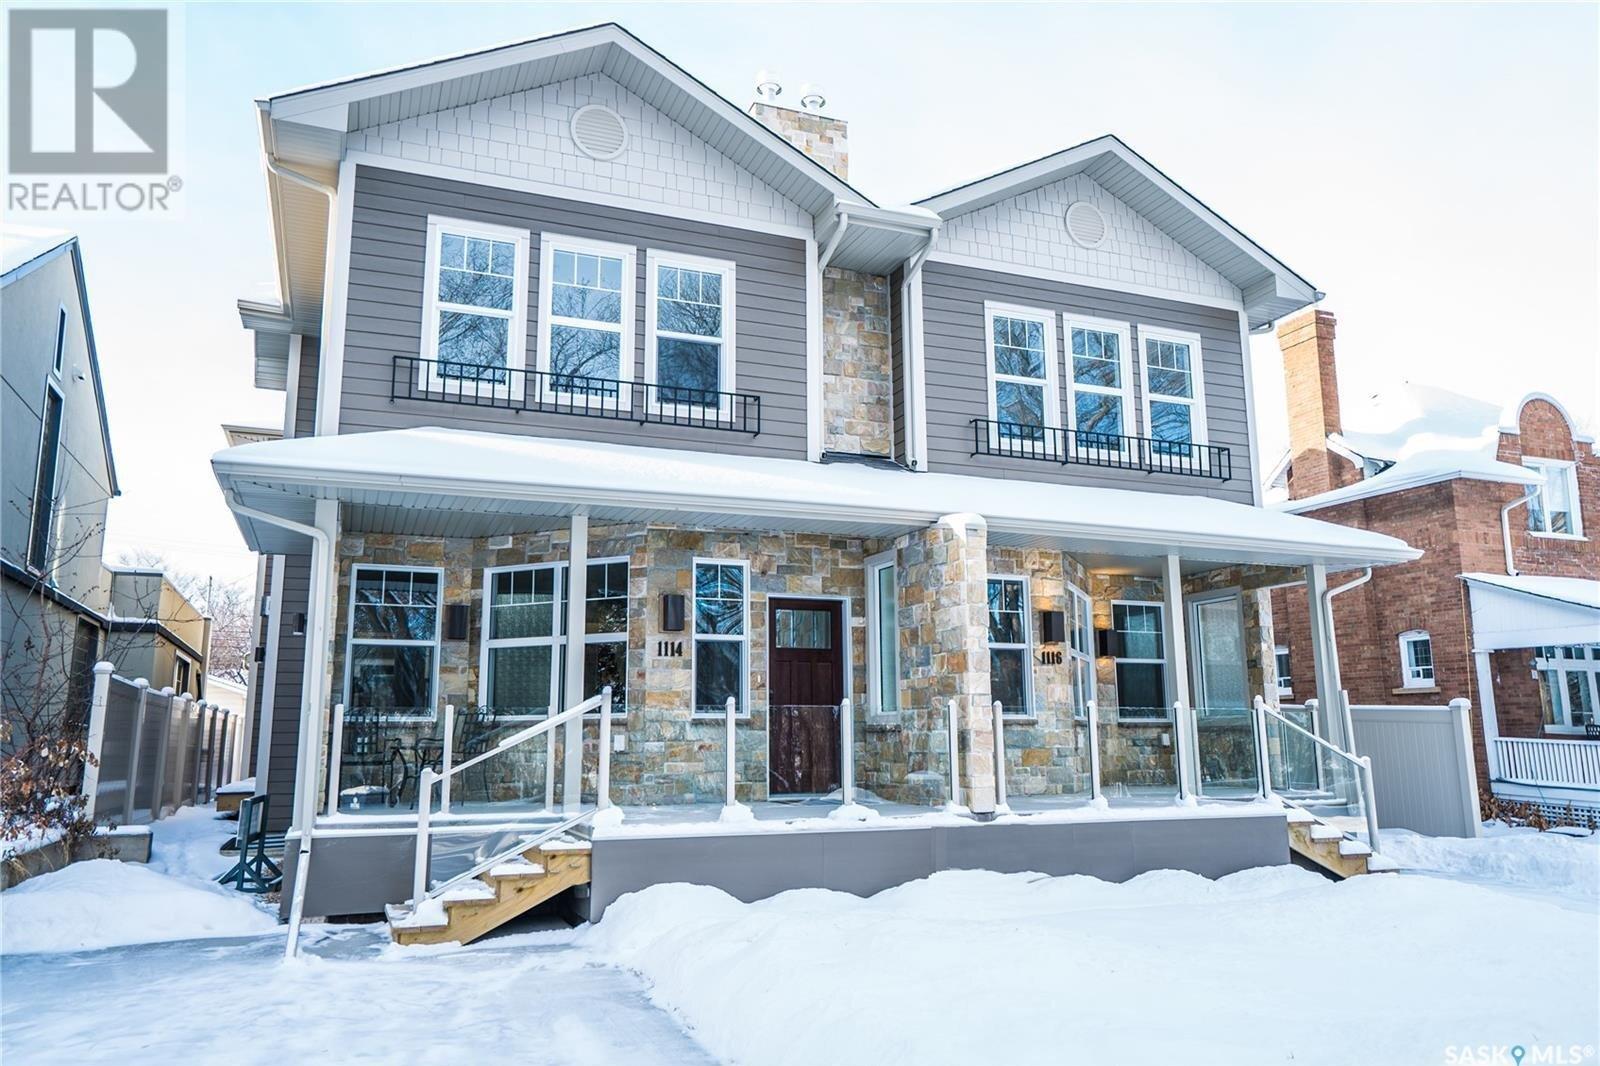 House for sale at 1114 Spadina Cres E Saskatoon Saskatchewan - MLS: SK819483